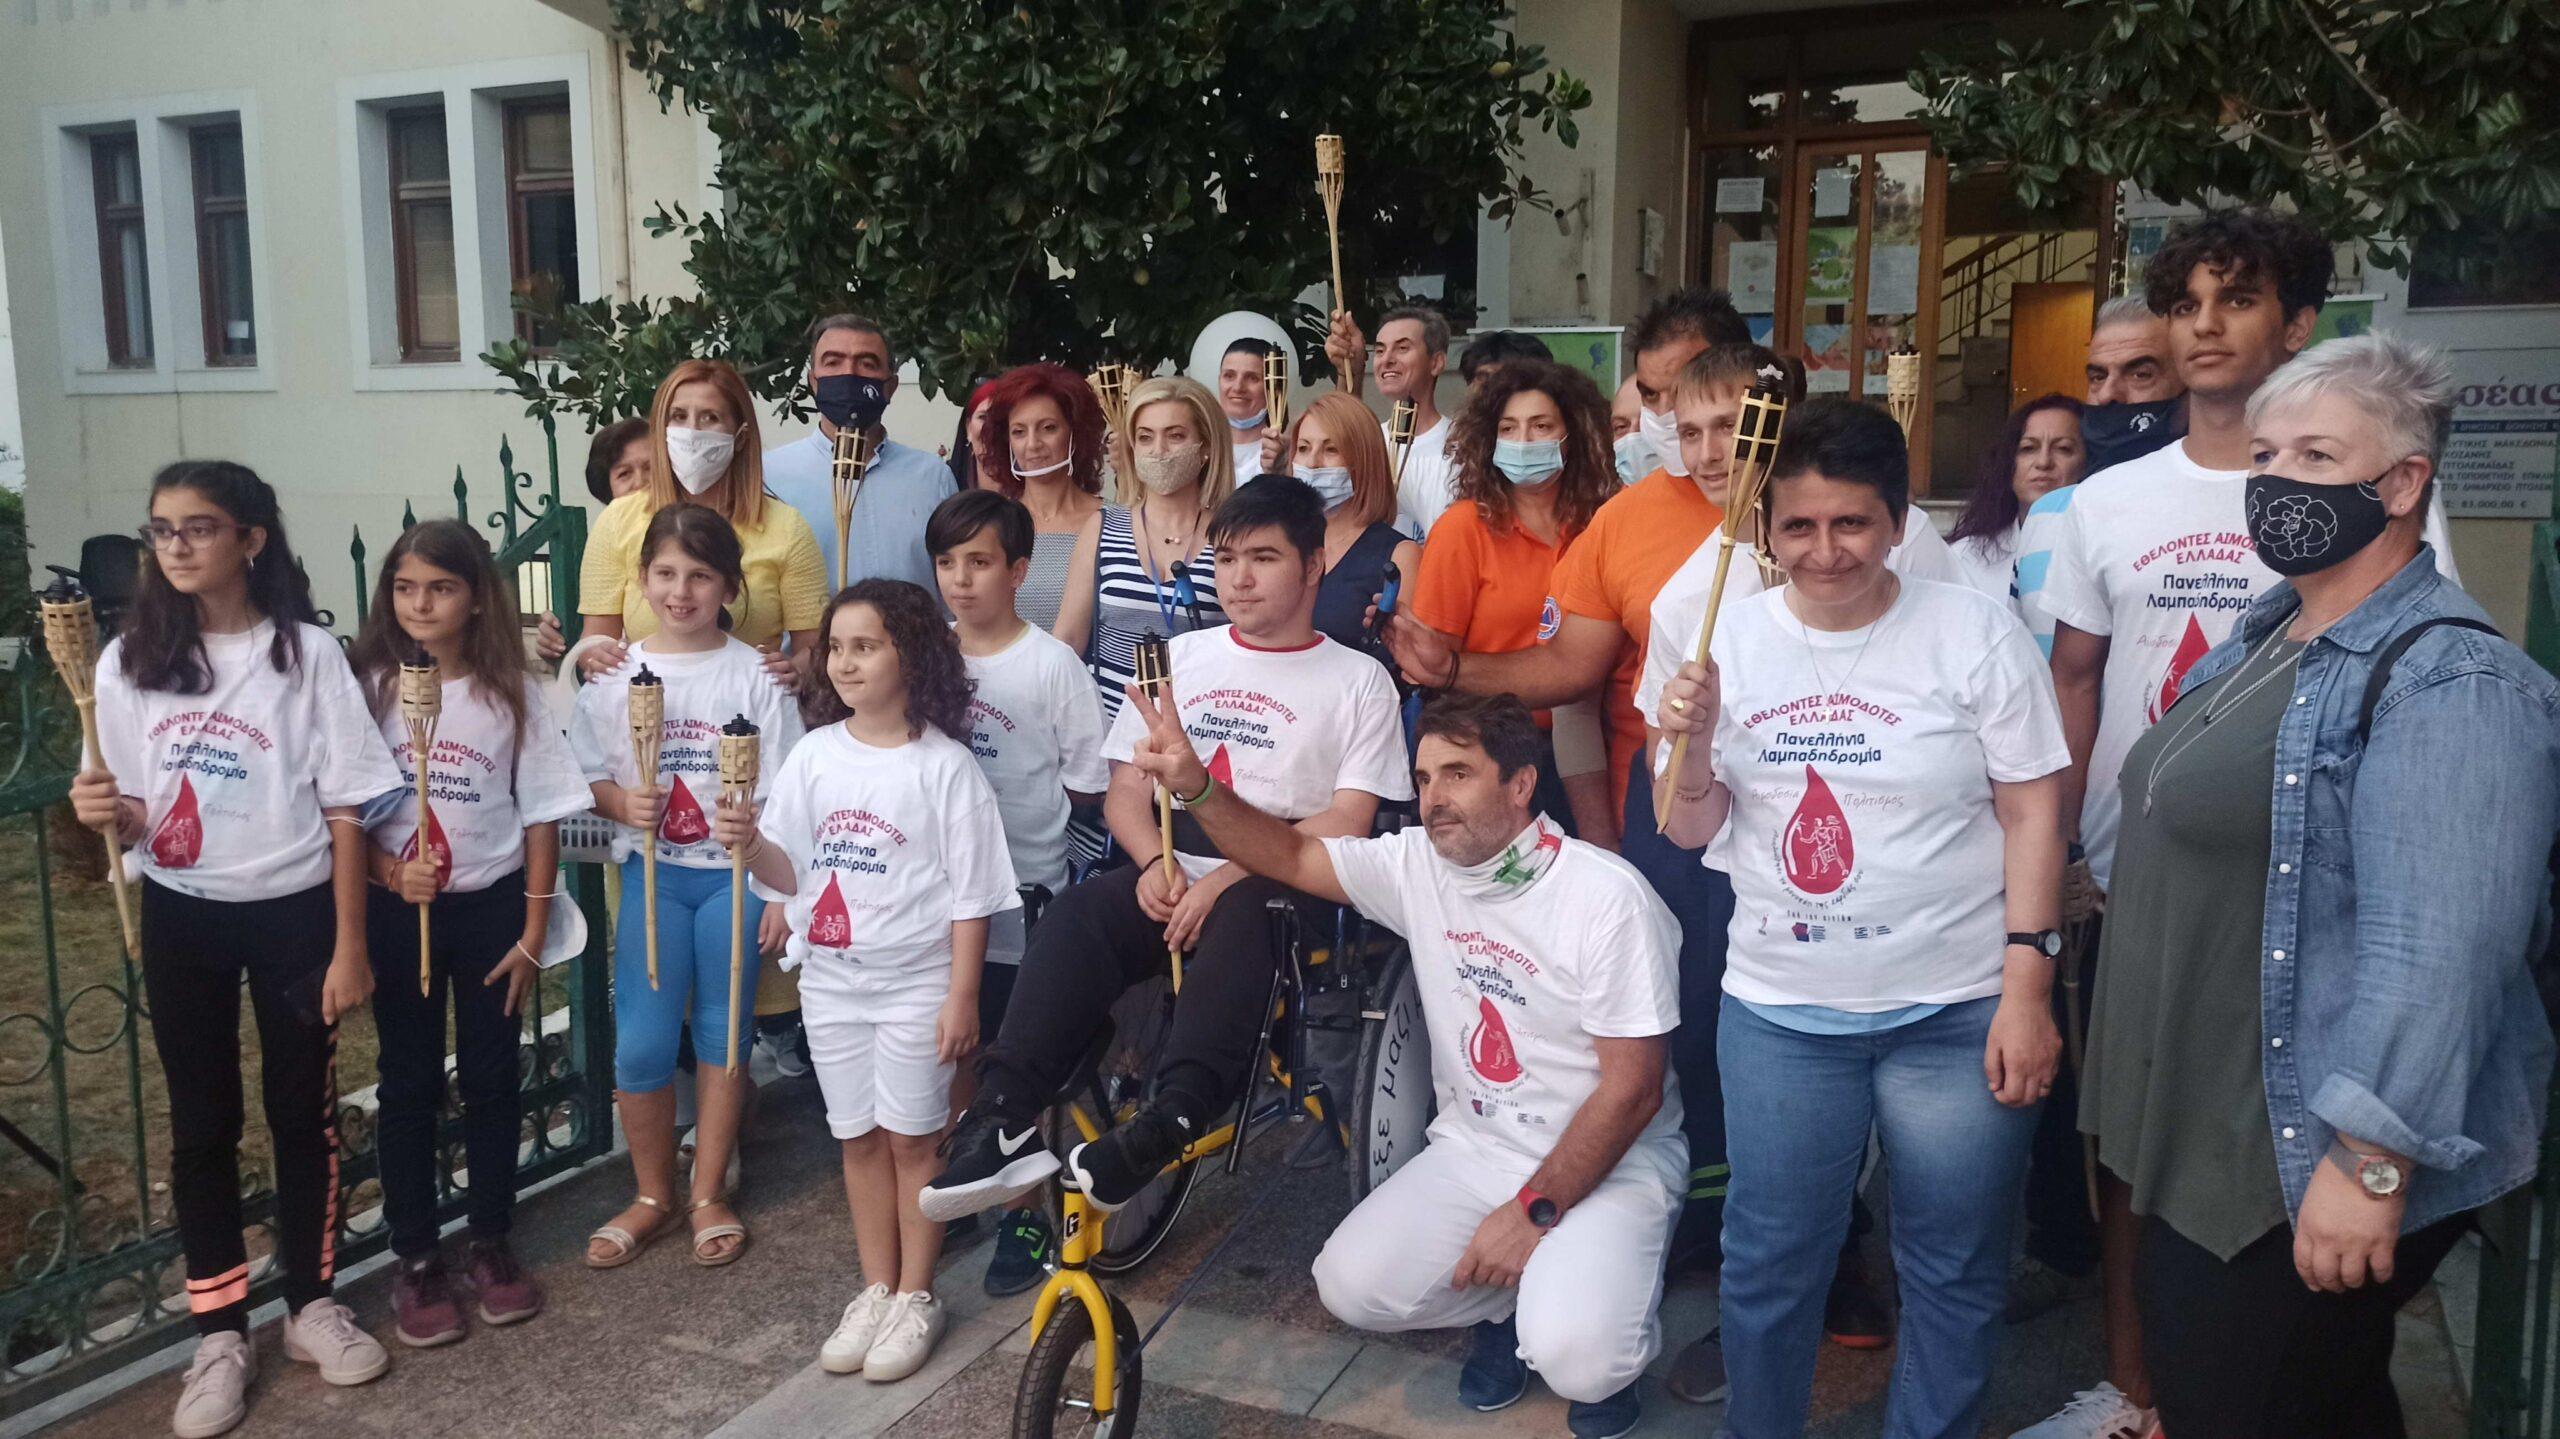 Eordaialive.com: O Δήμος Εορδαίας Συμμετείχε στην Ευρωπαϊκή Εβδομάδα Κινητικότητας (βίντεο-φωτο) 15